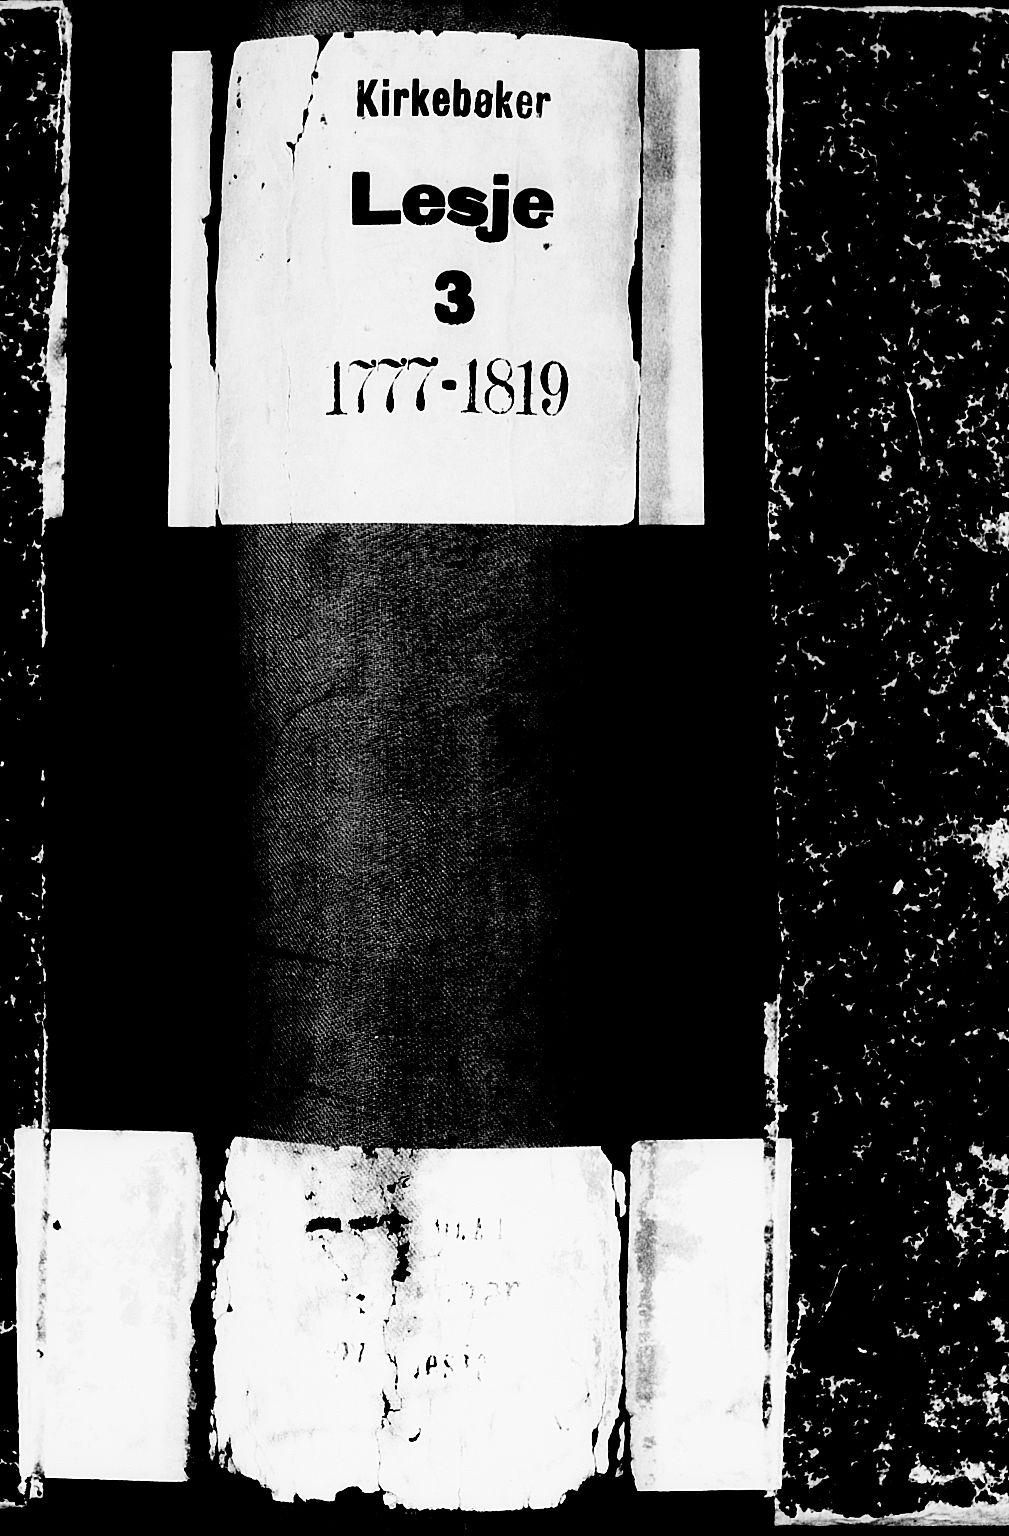 SAH, Lesja prestekontor, Ministerialbok nr. 3, 1777-1819